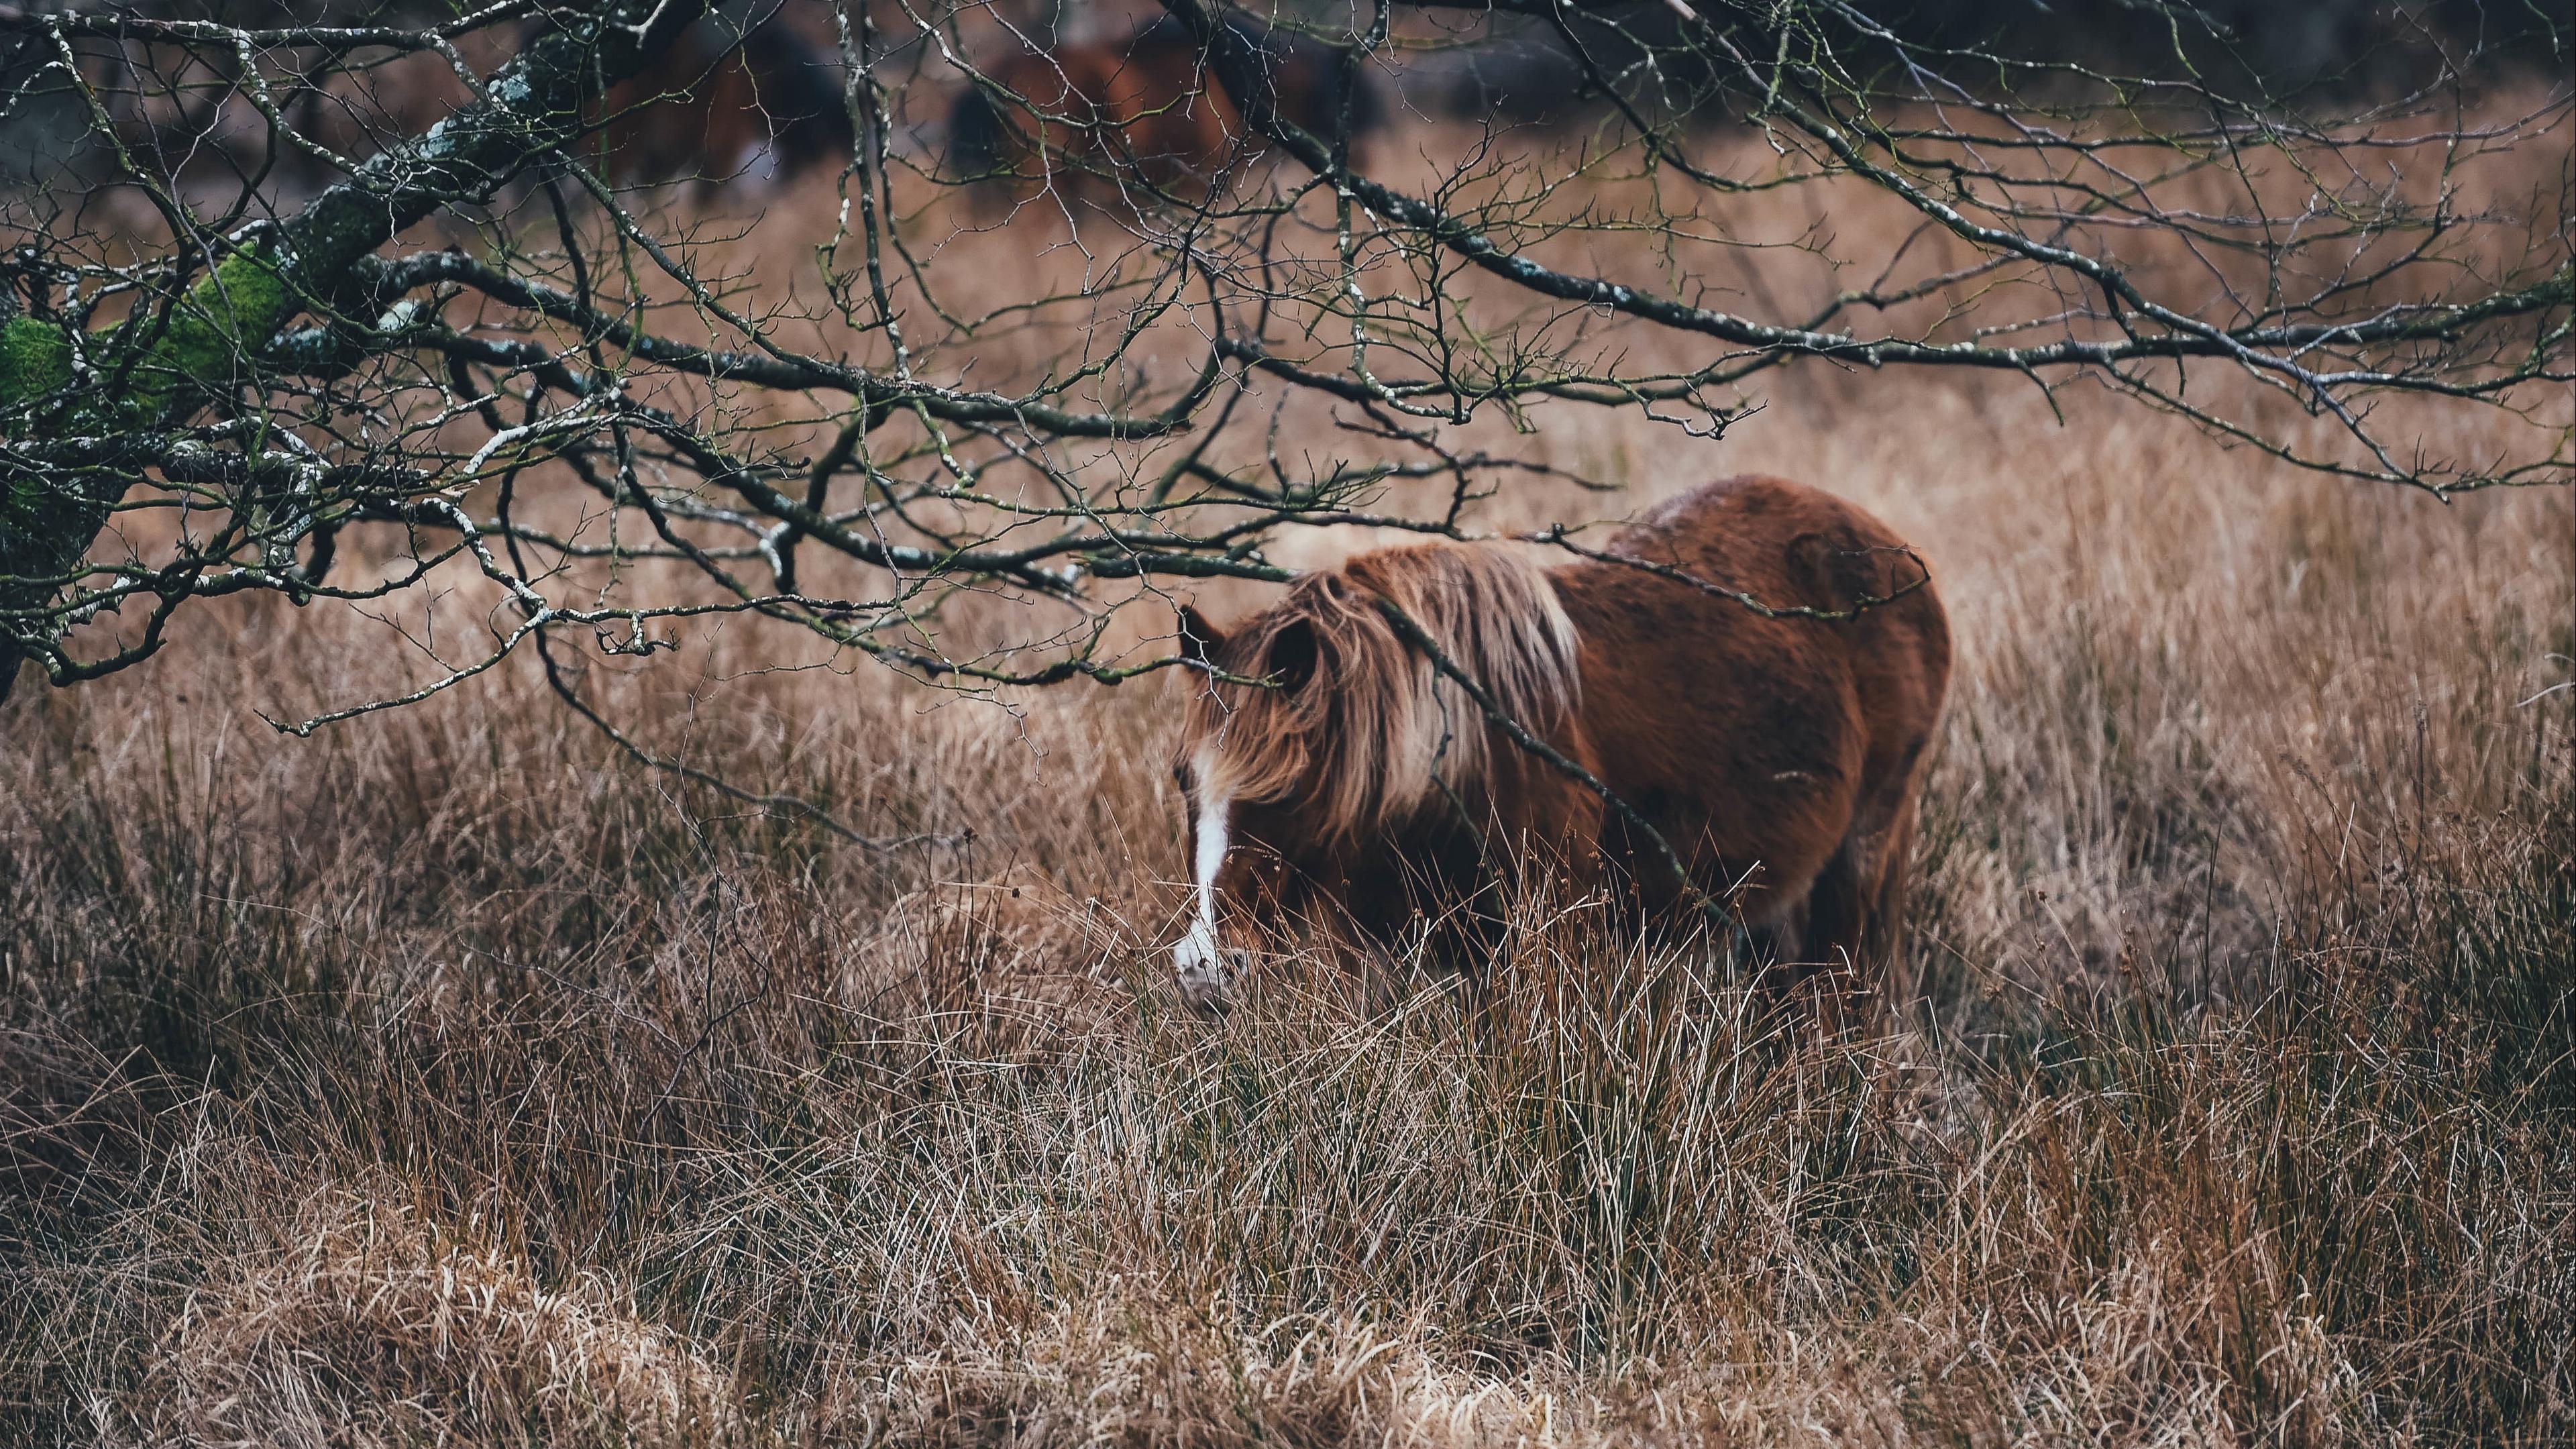 pony horse grass pasture 4k 1542241669 - pony, horse, grass, pasture 4k - Pony, horse, Grass